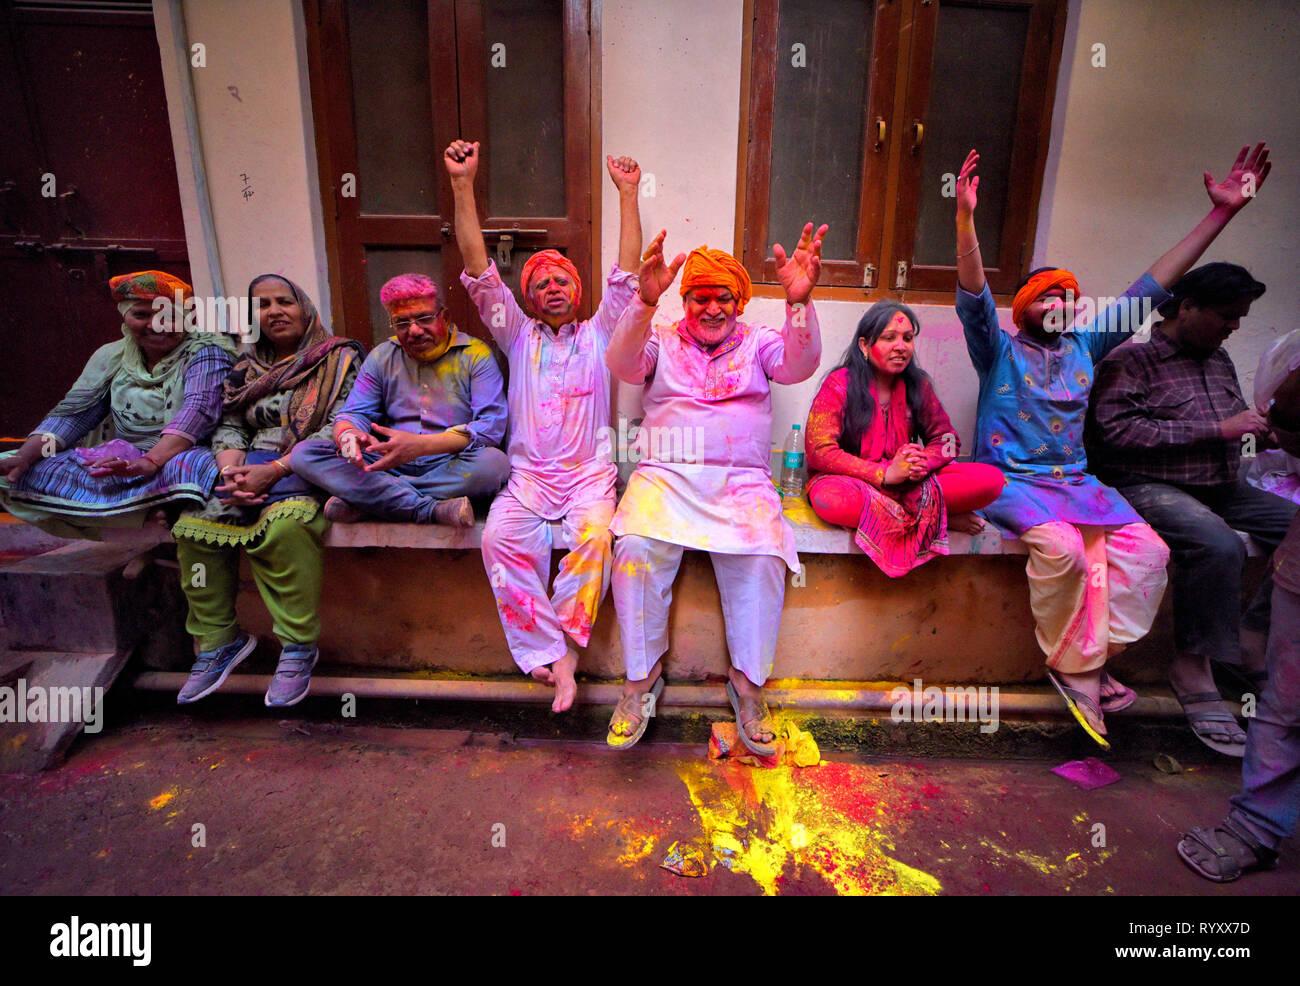 Barsana, Uttar Pradesh, India  15th Mar, 2019  Devotees seen